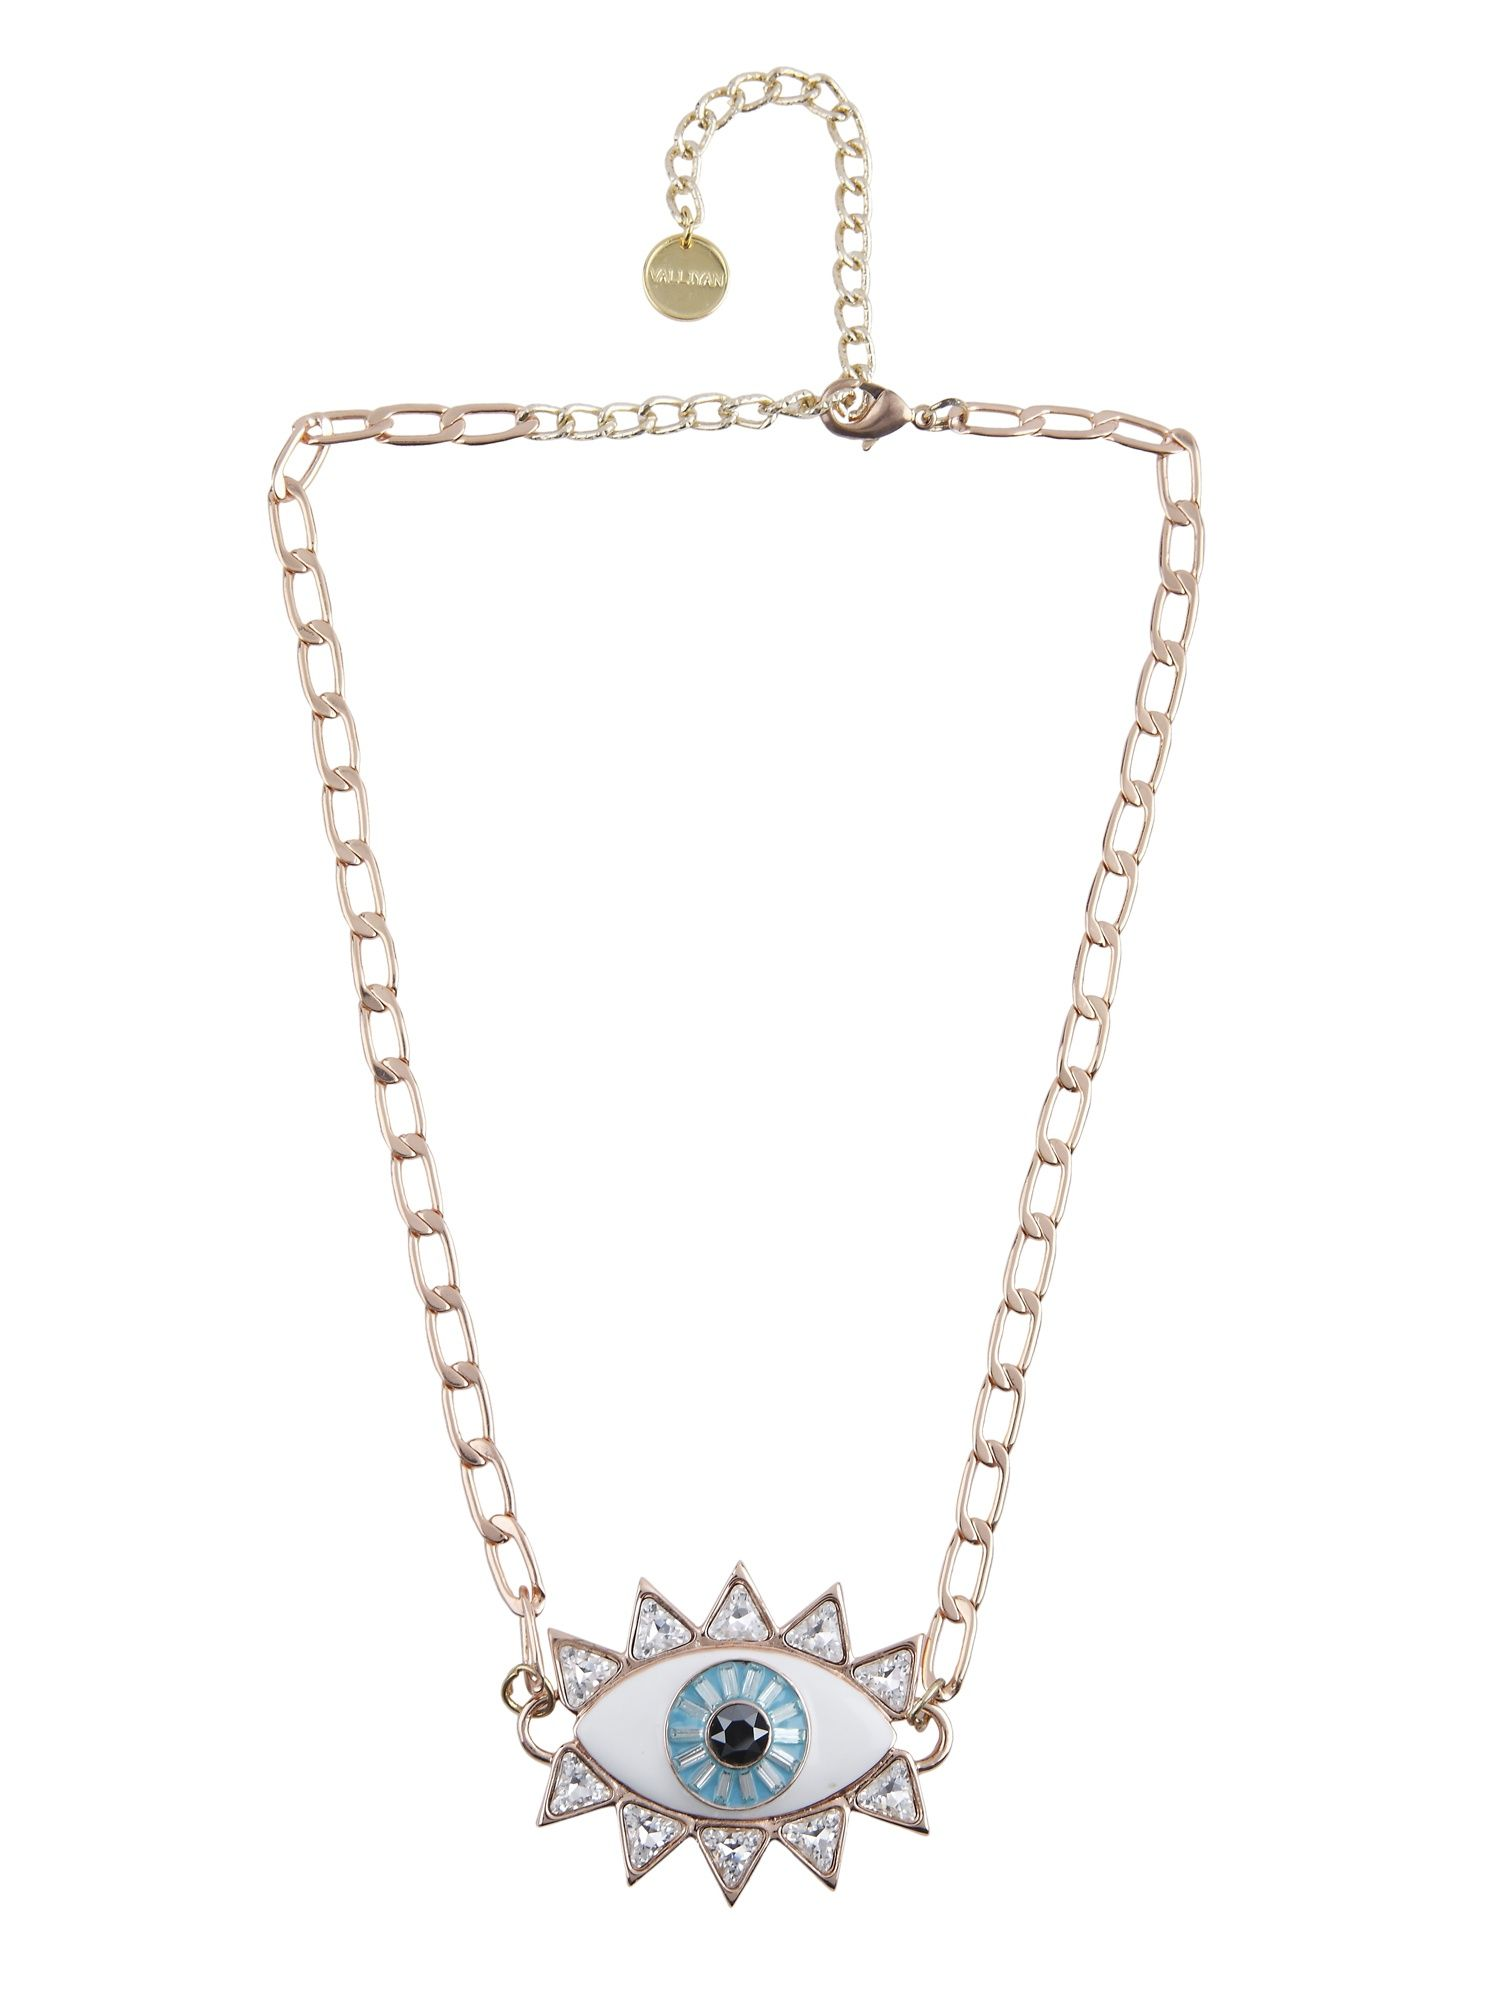 9b6122fb6 Valliyan Necklaces and Chokers : Buy Valliyan Evil Eye Necklace ...